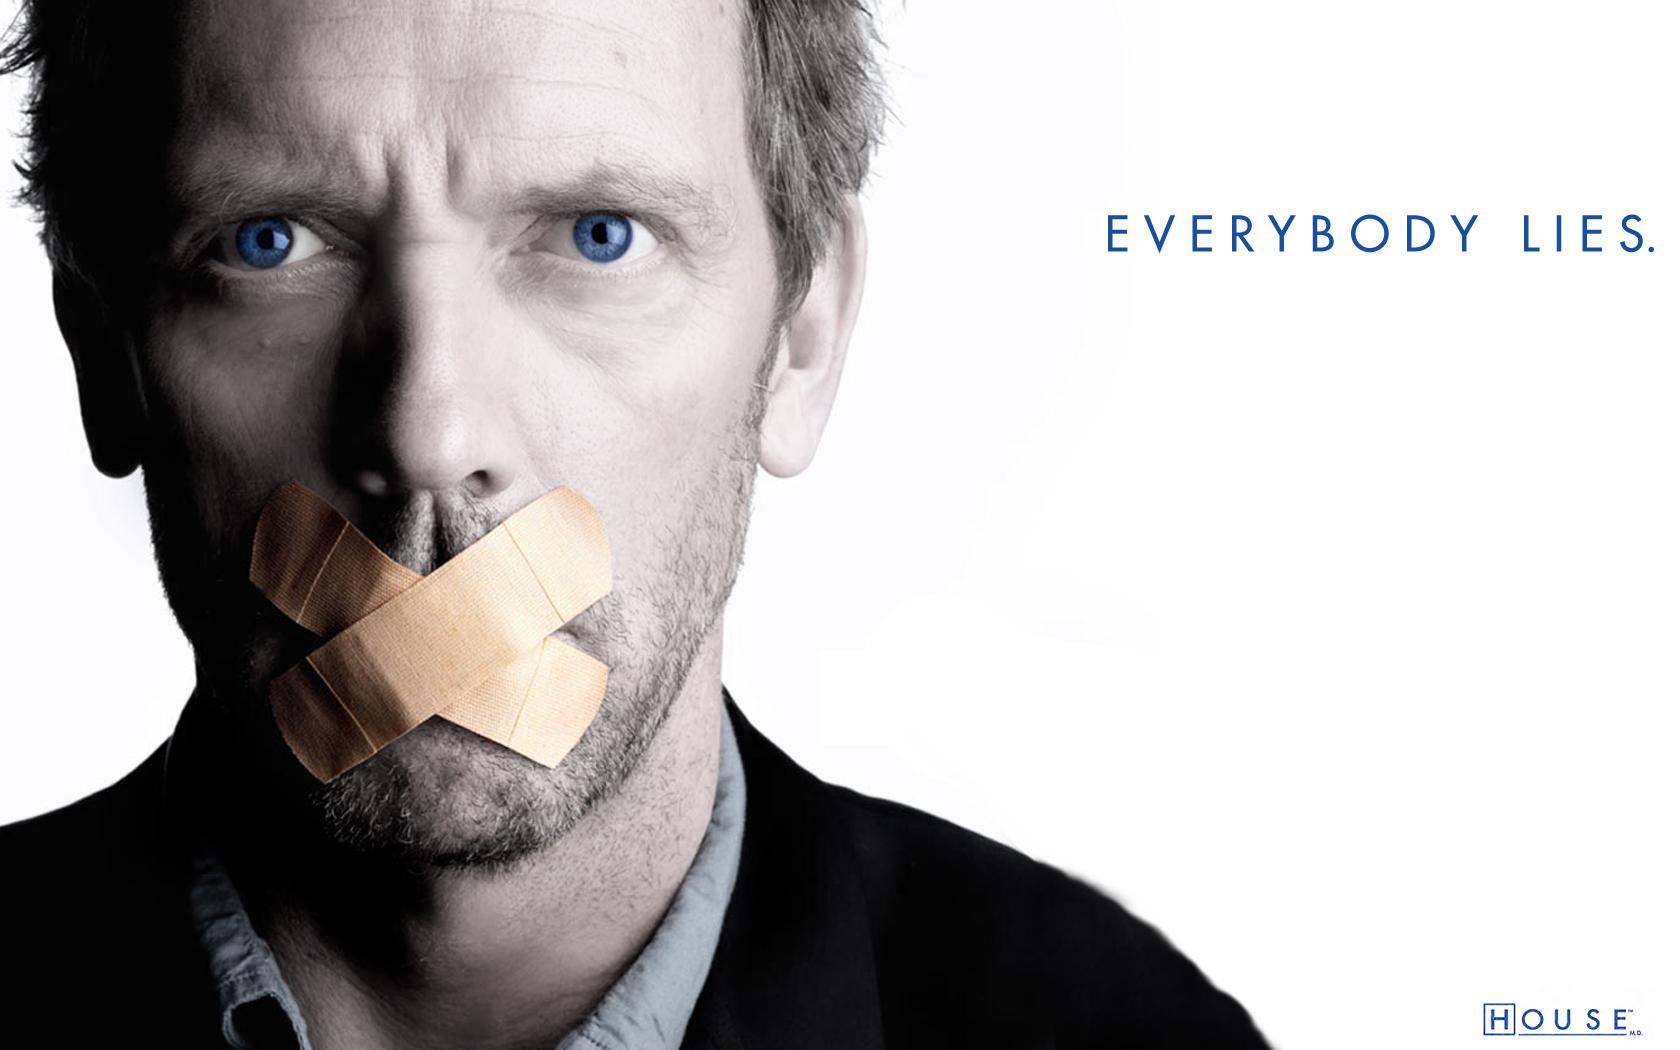 House Everybody Lies